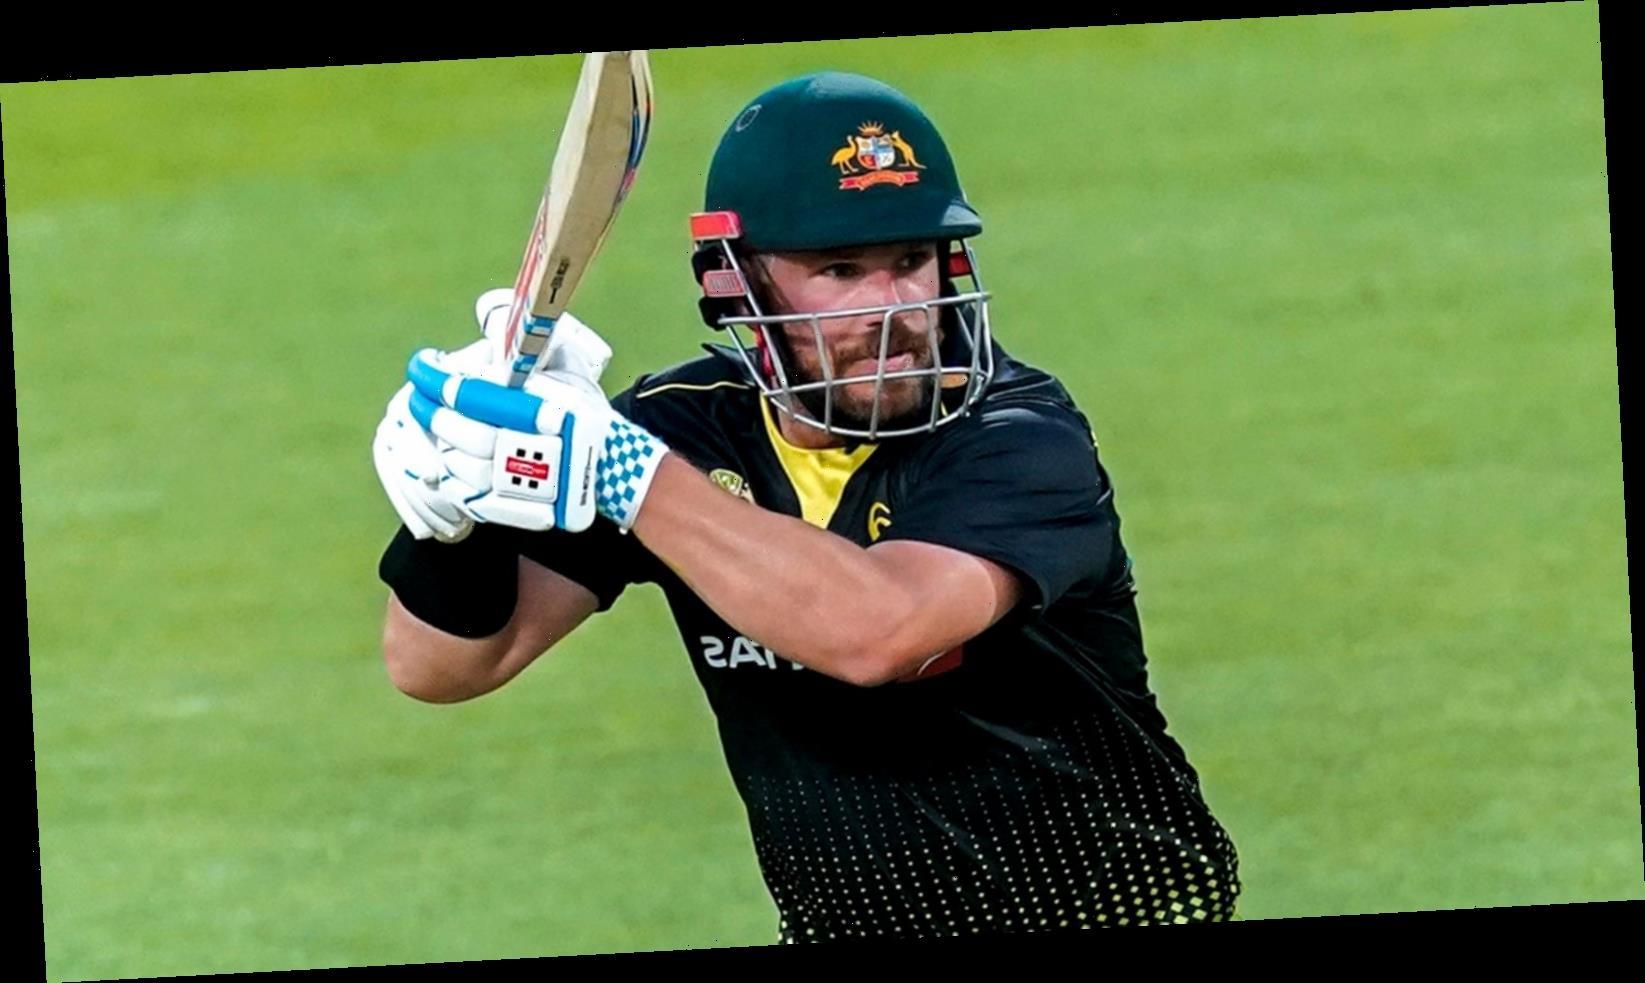 Australia thrash New Zealand by 50 runs in fourth T20 international to set up series decider